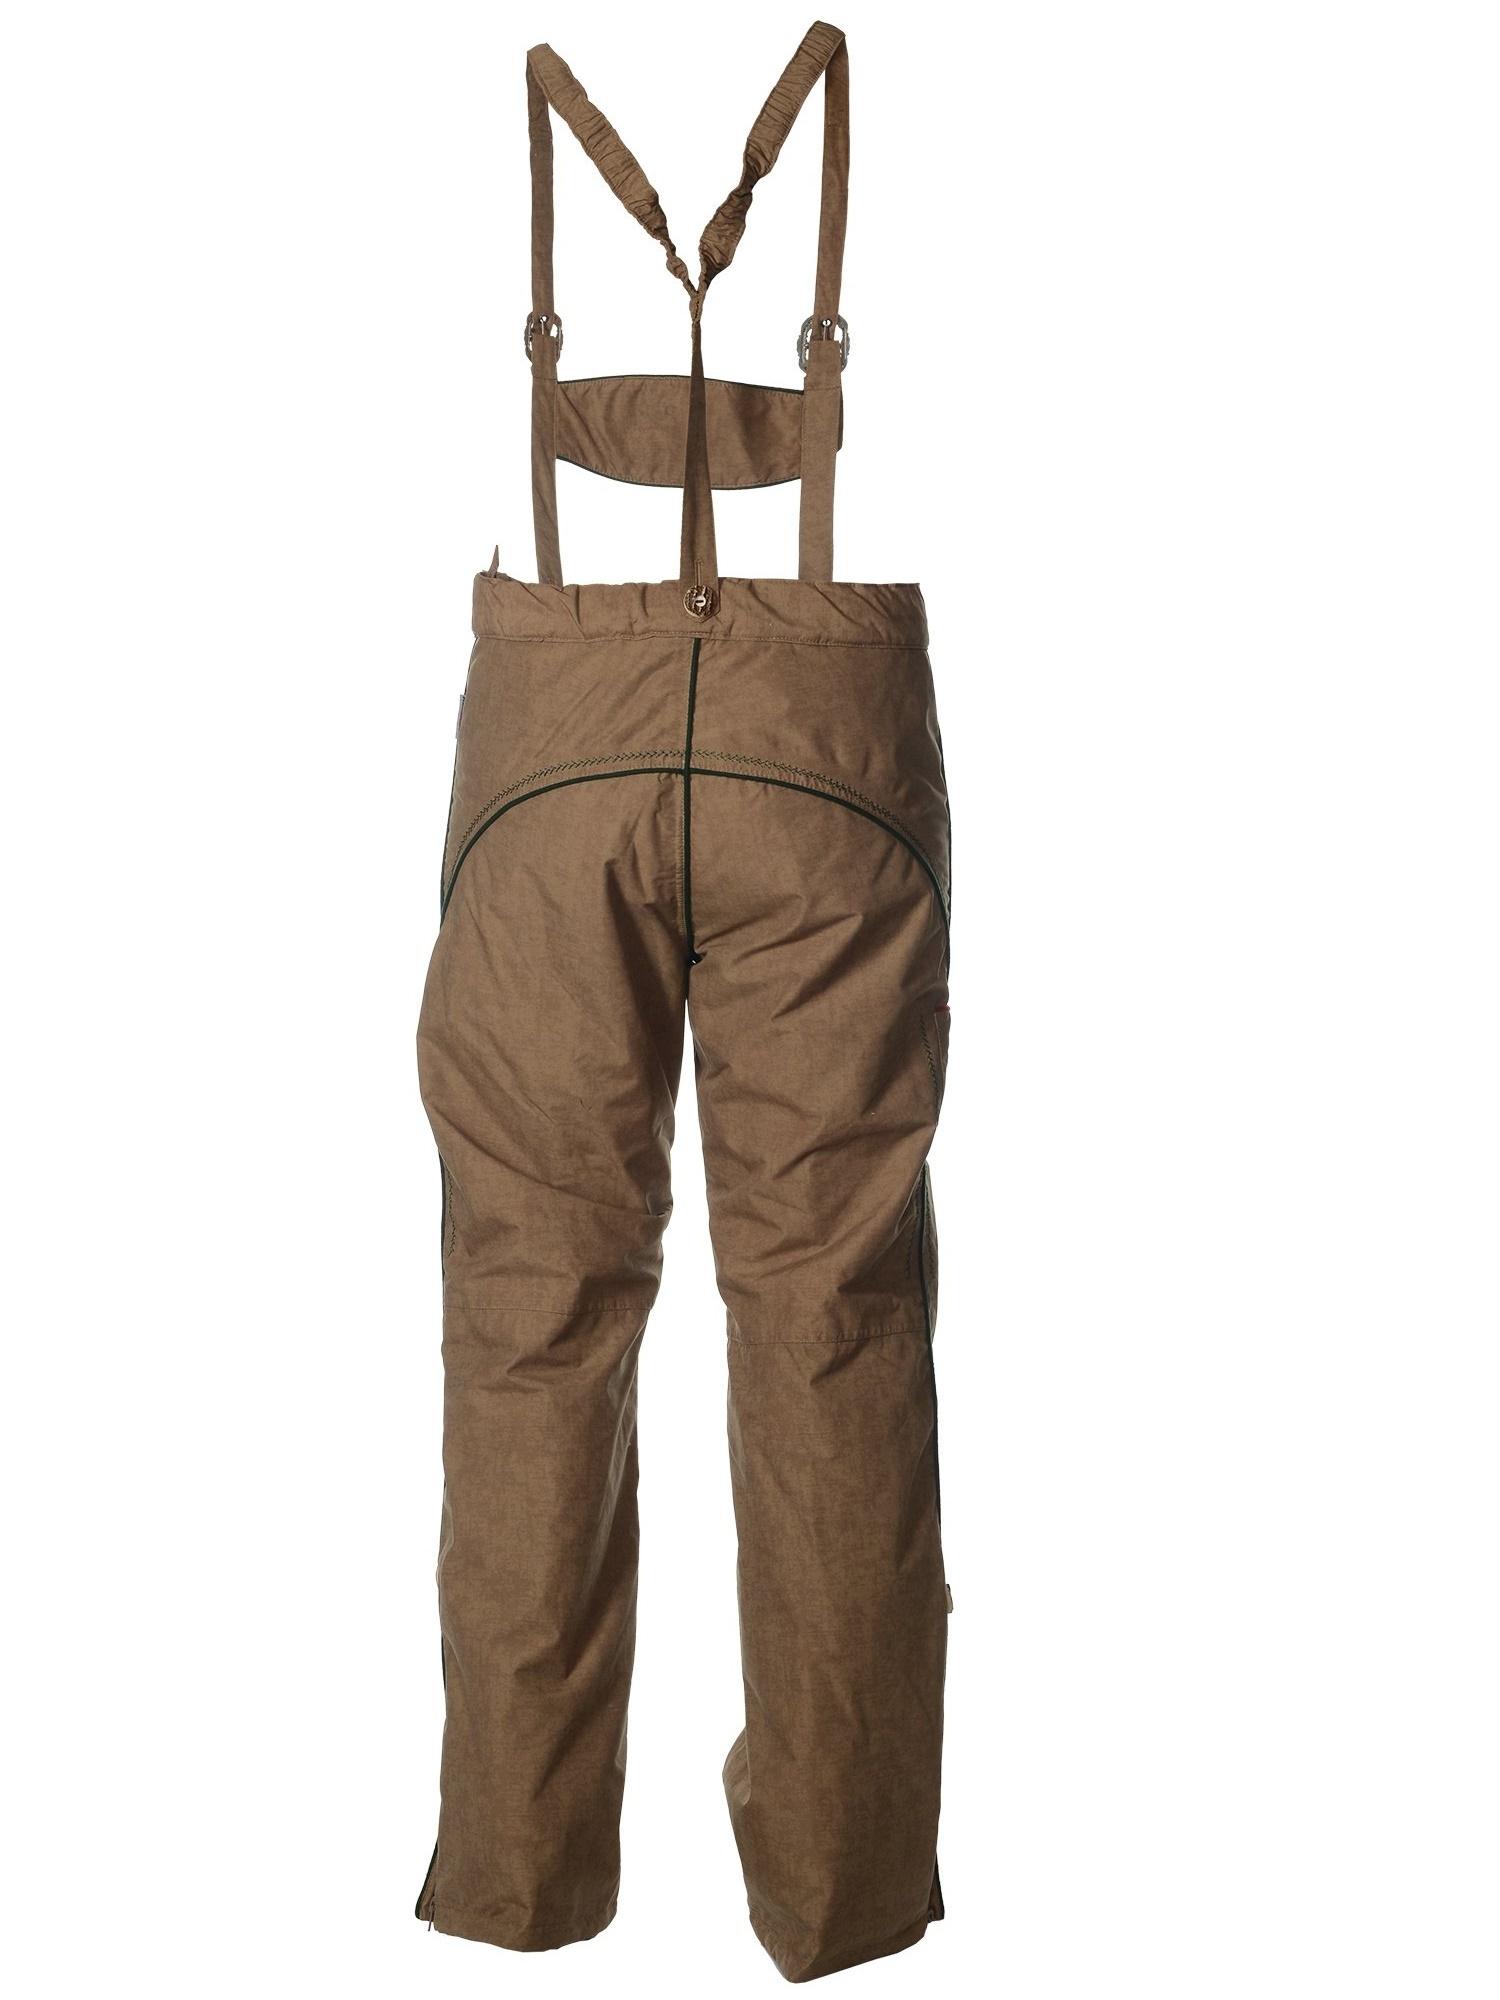 Мужской горнолыжный костюм Almrausch Steinpass-Lois зеленый